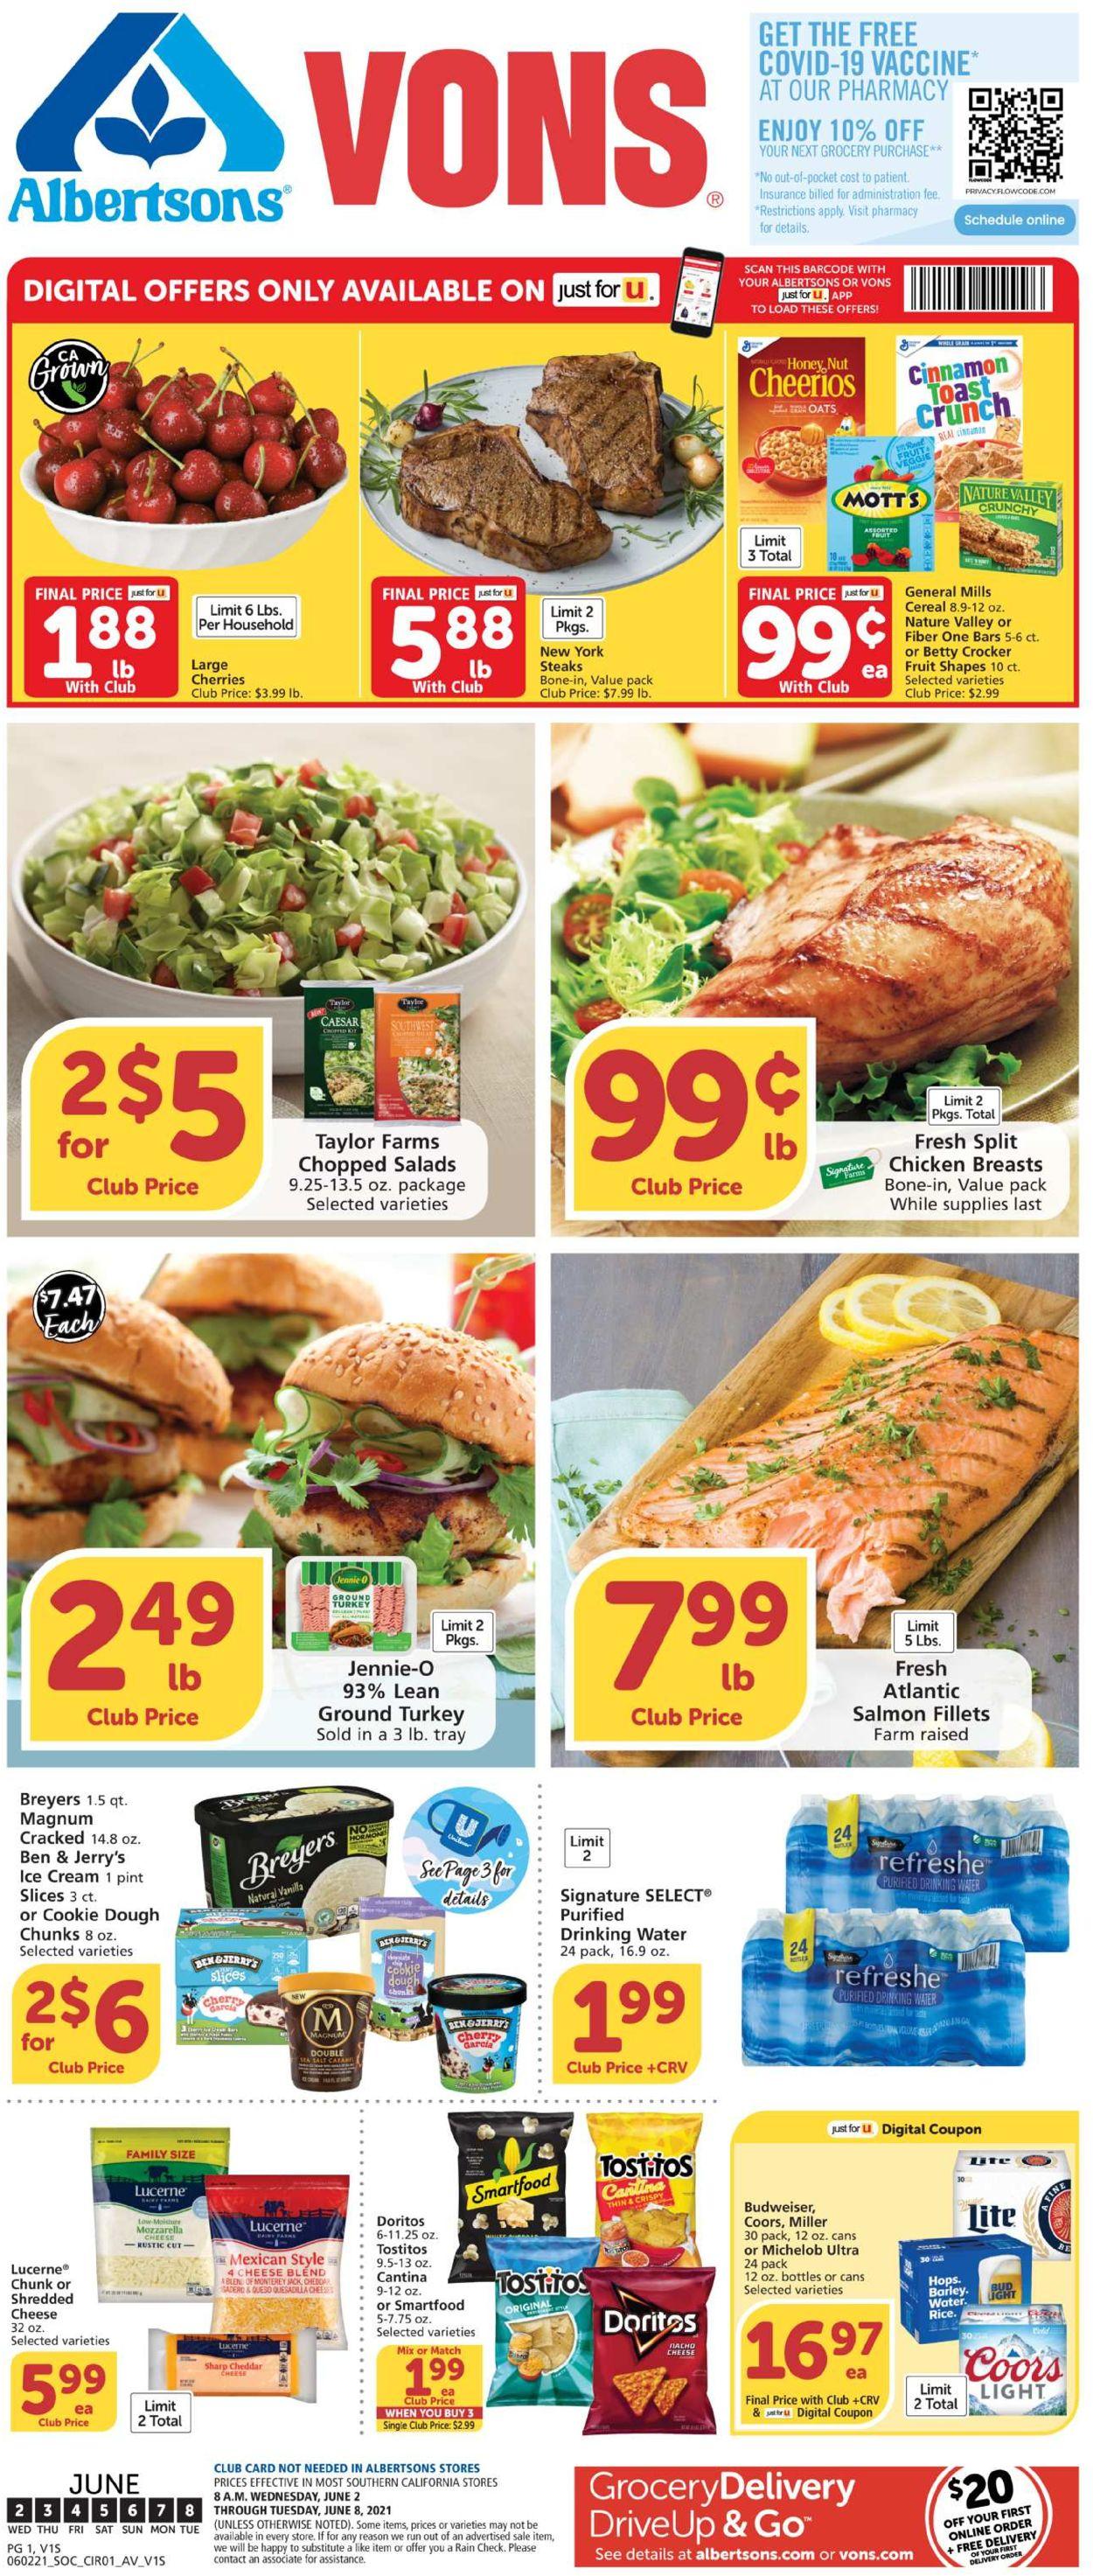 Vons Weekly Ad Circular - valid 06/02-06/08/2021